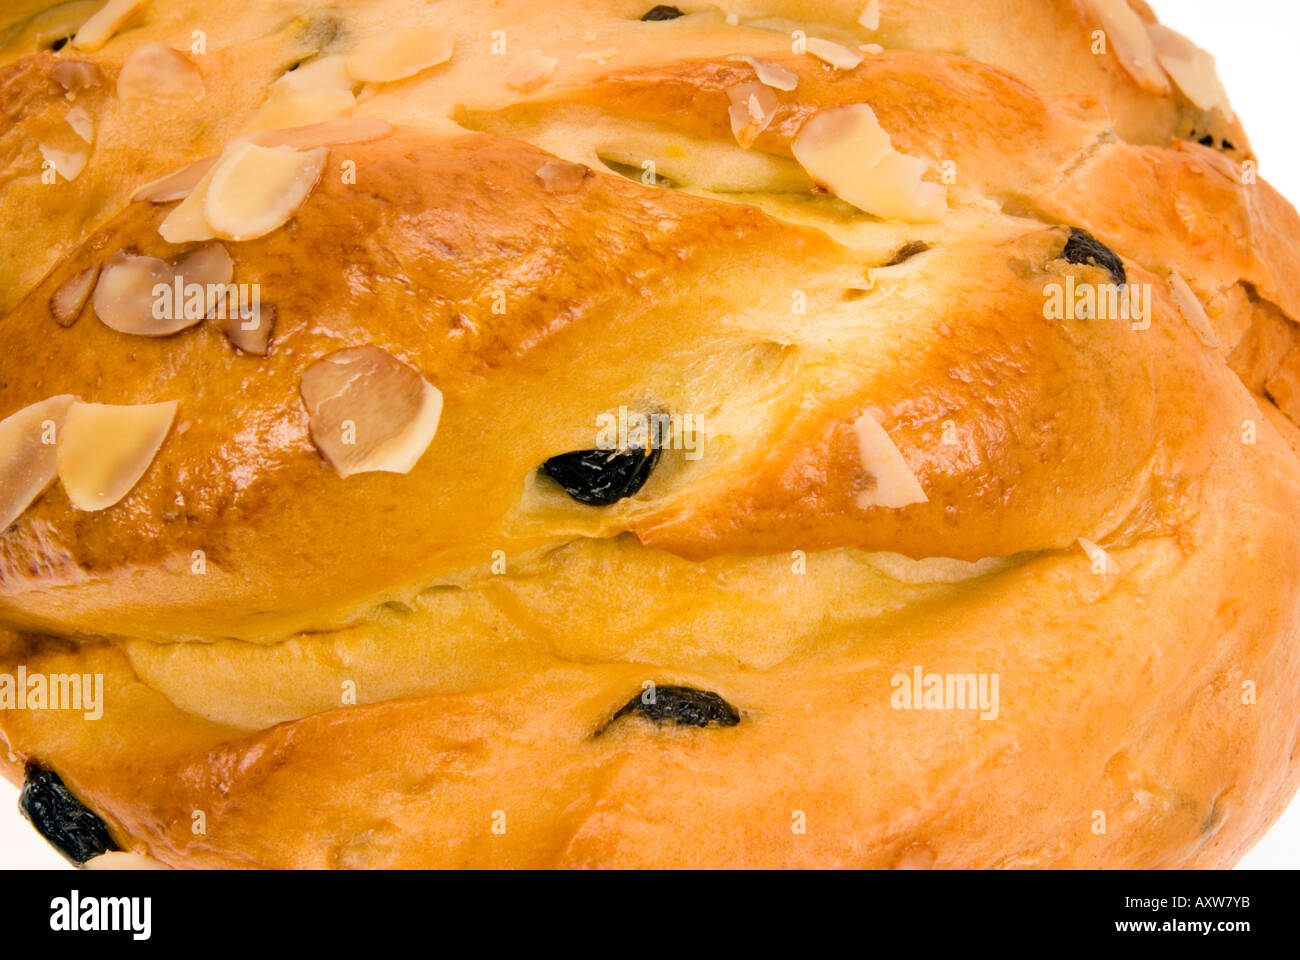 Brotchen Brot Roll Kuchen Teig Gesauert Stockfoto Bild 9669370 Alamy